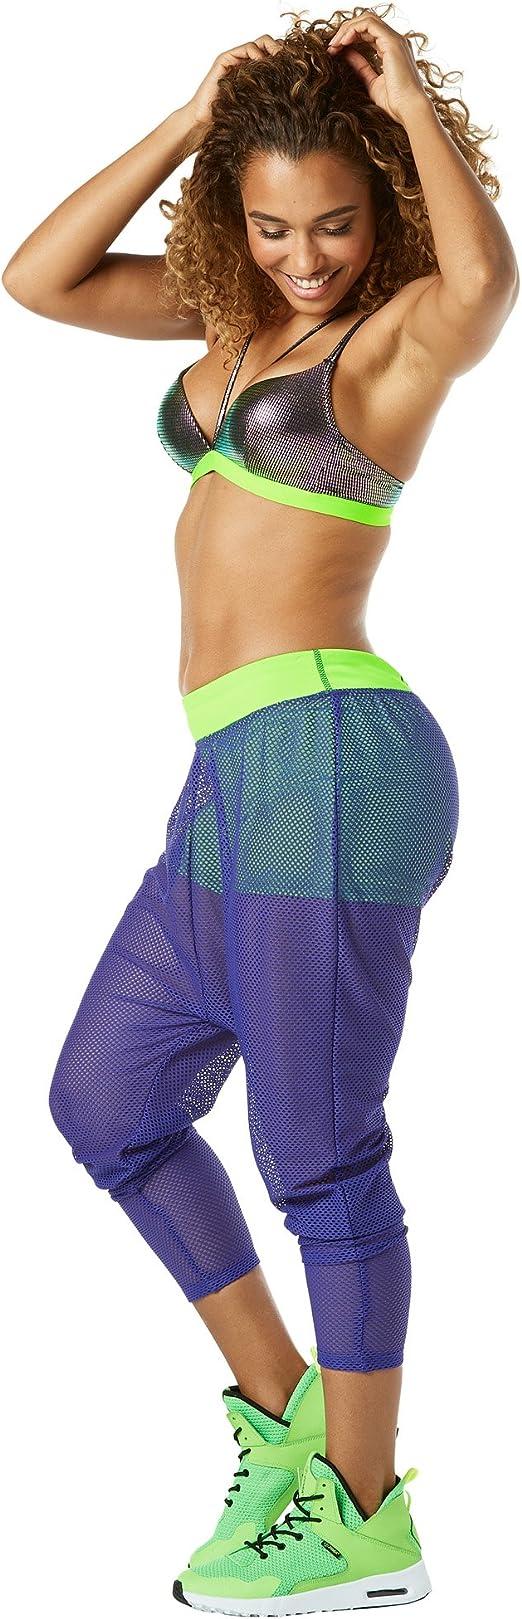 Zumba Fitness Zumba Harem Capri Pantalon Sport Femme dEntra/înement Dance Fitness Haute de Surv/êtement Pants Z Denim S